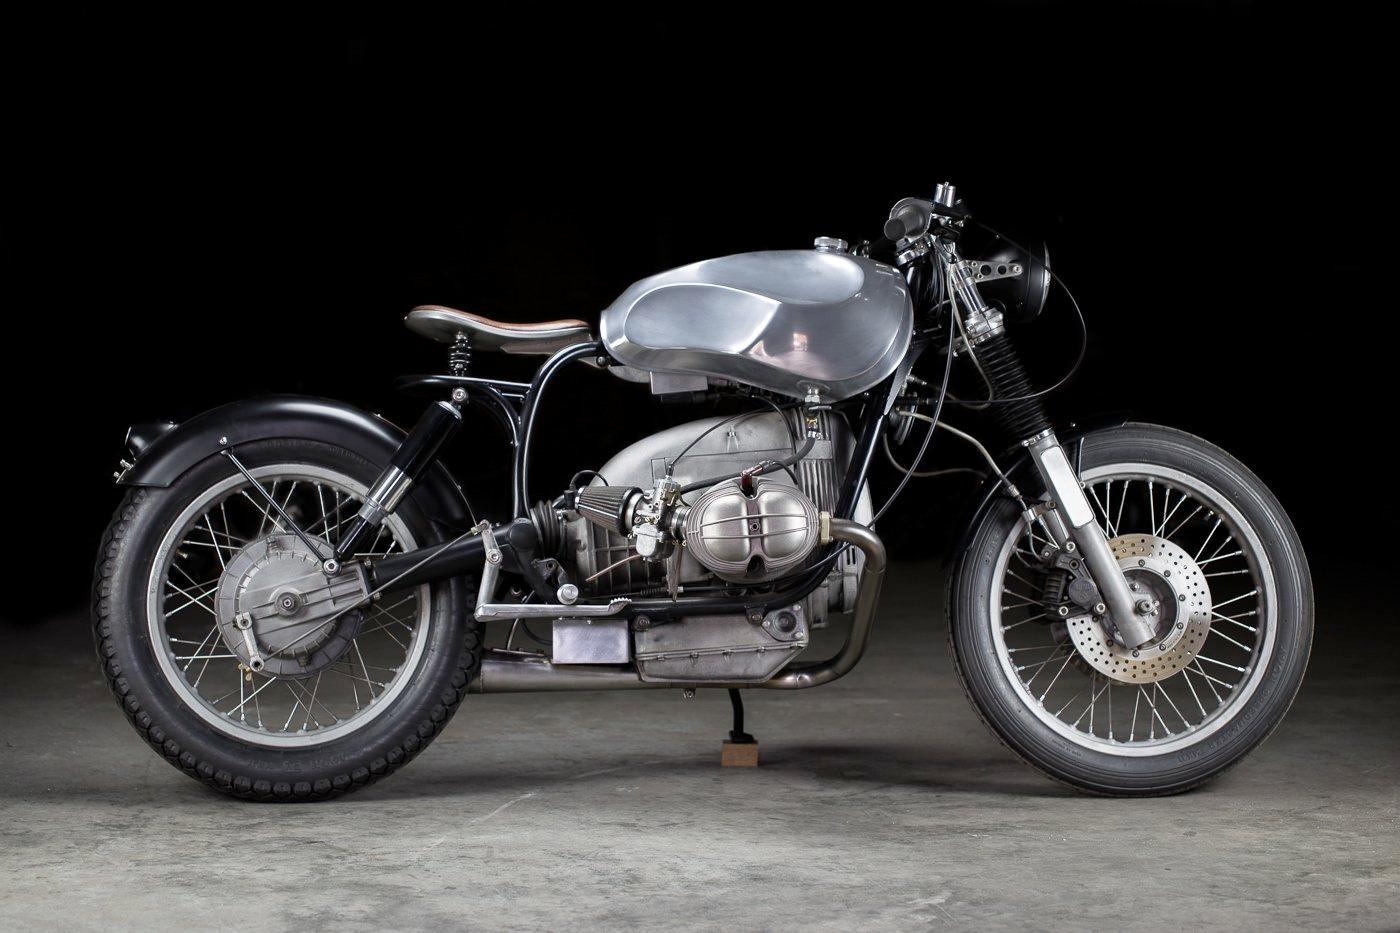 Sette Nero Scintilla - motorcycles - red_wolf   ello